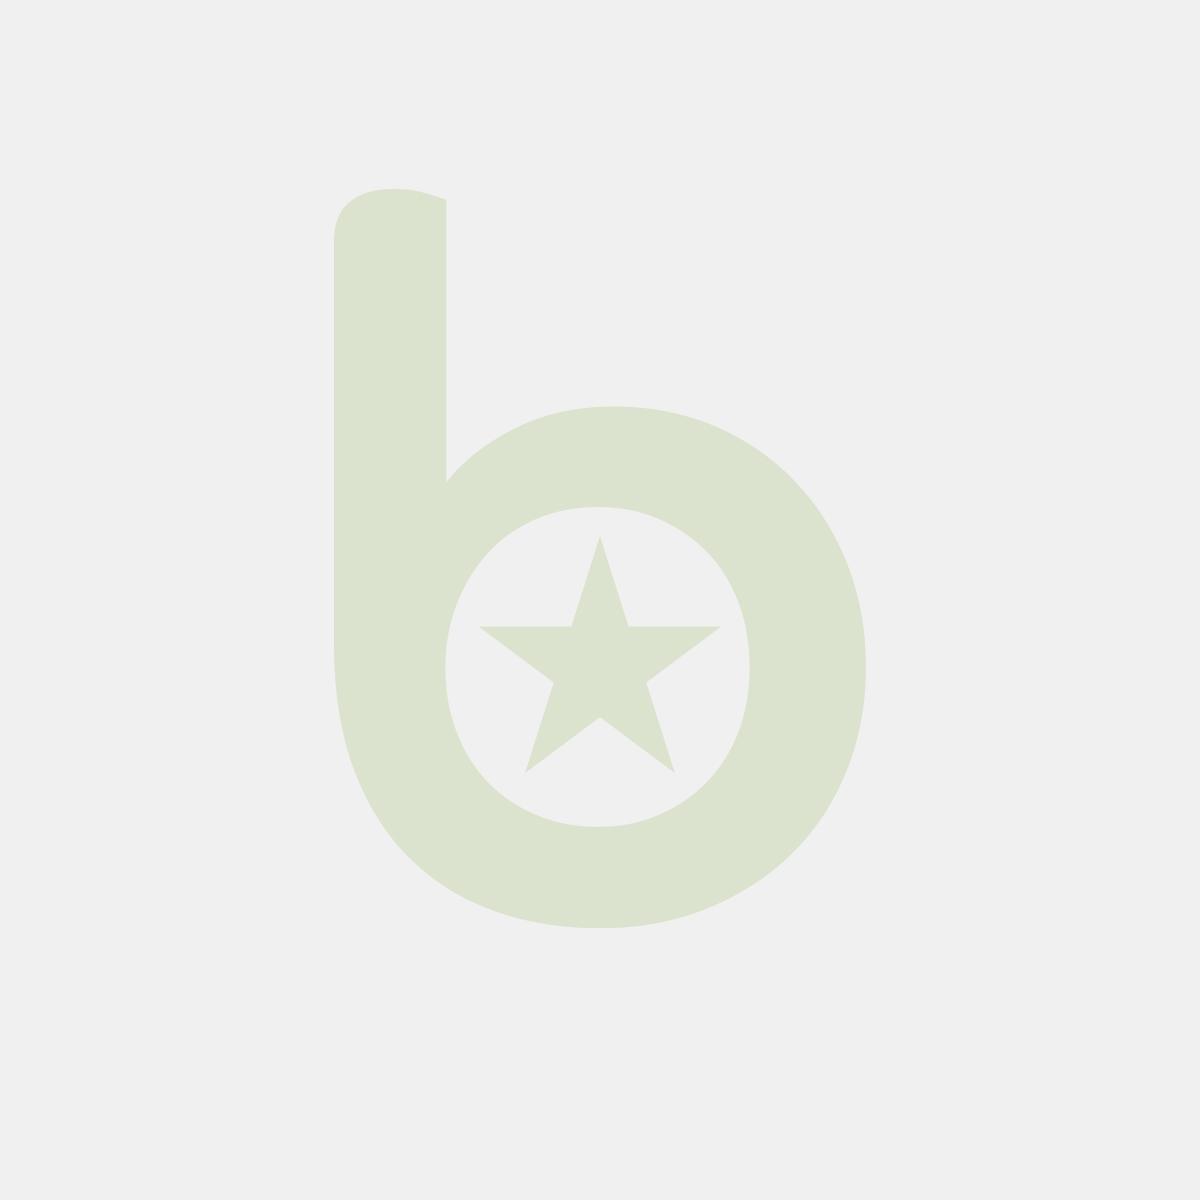 Taca prostokątna GN 1/1 53 x 32 x 2,5 cm czarna z melaminy